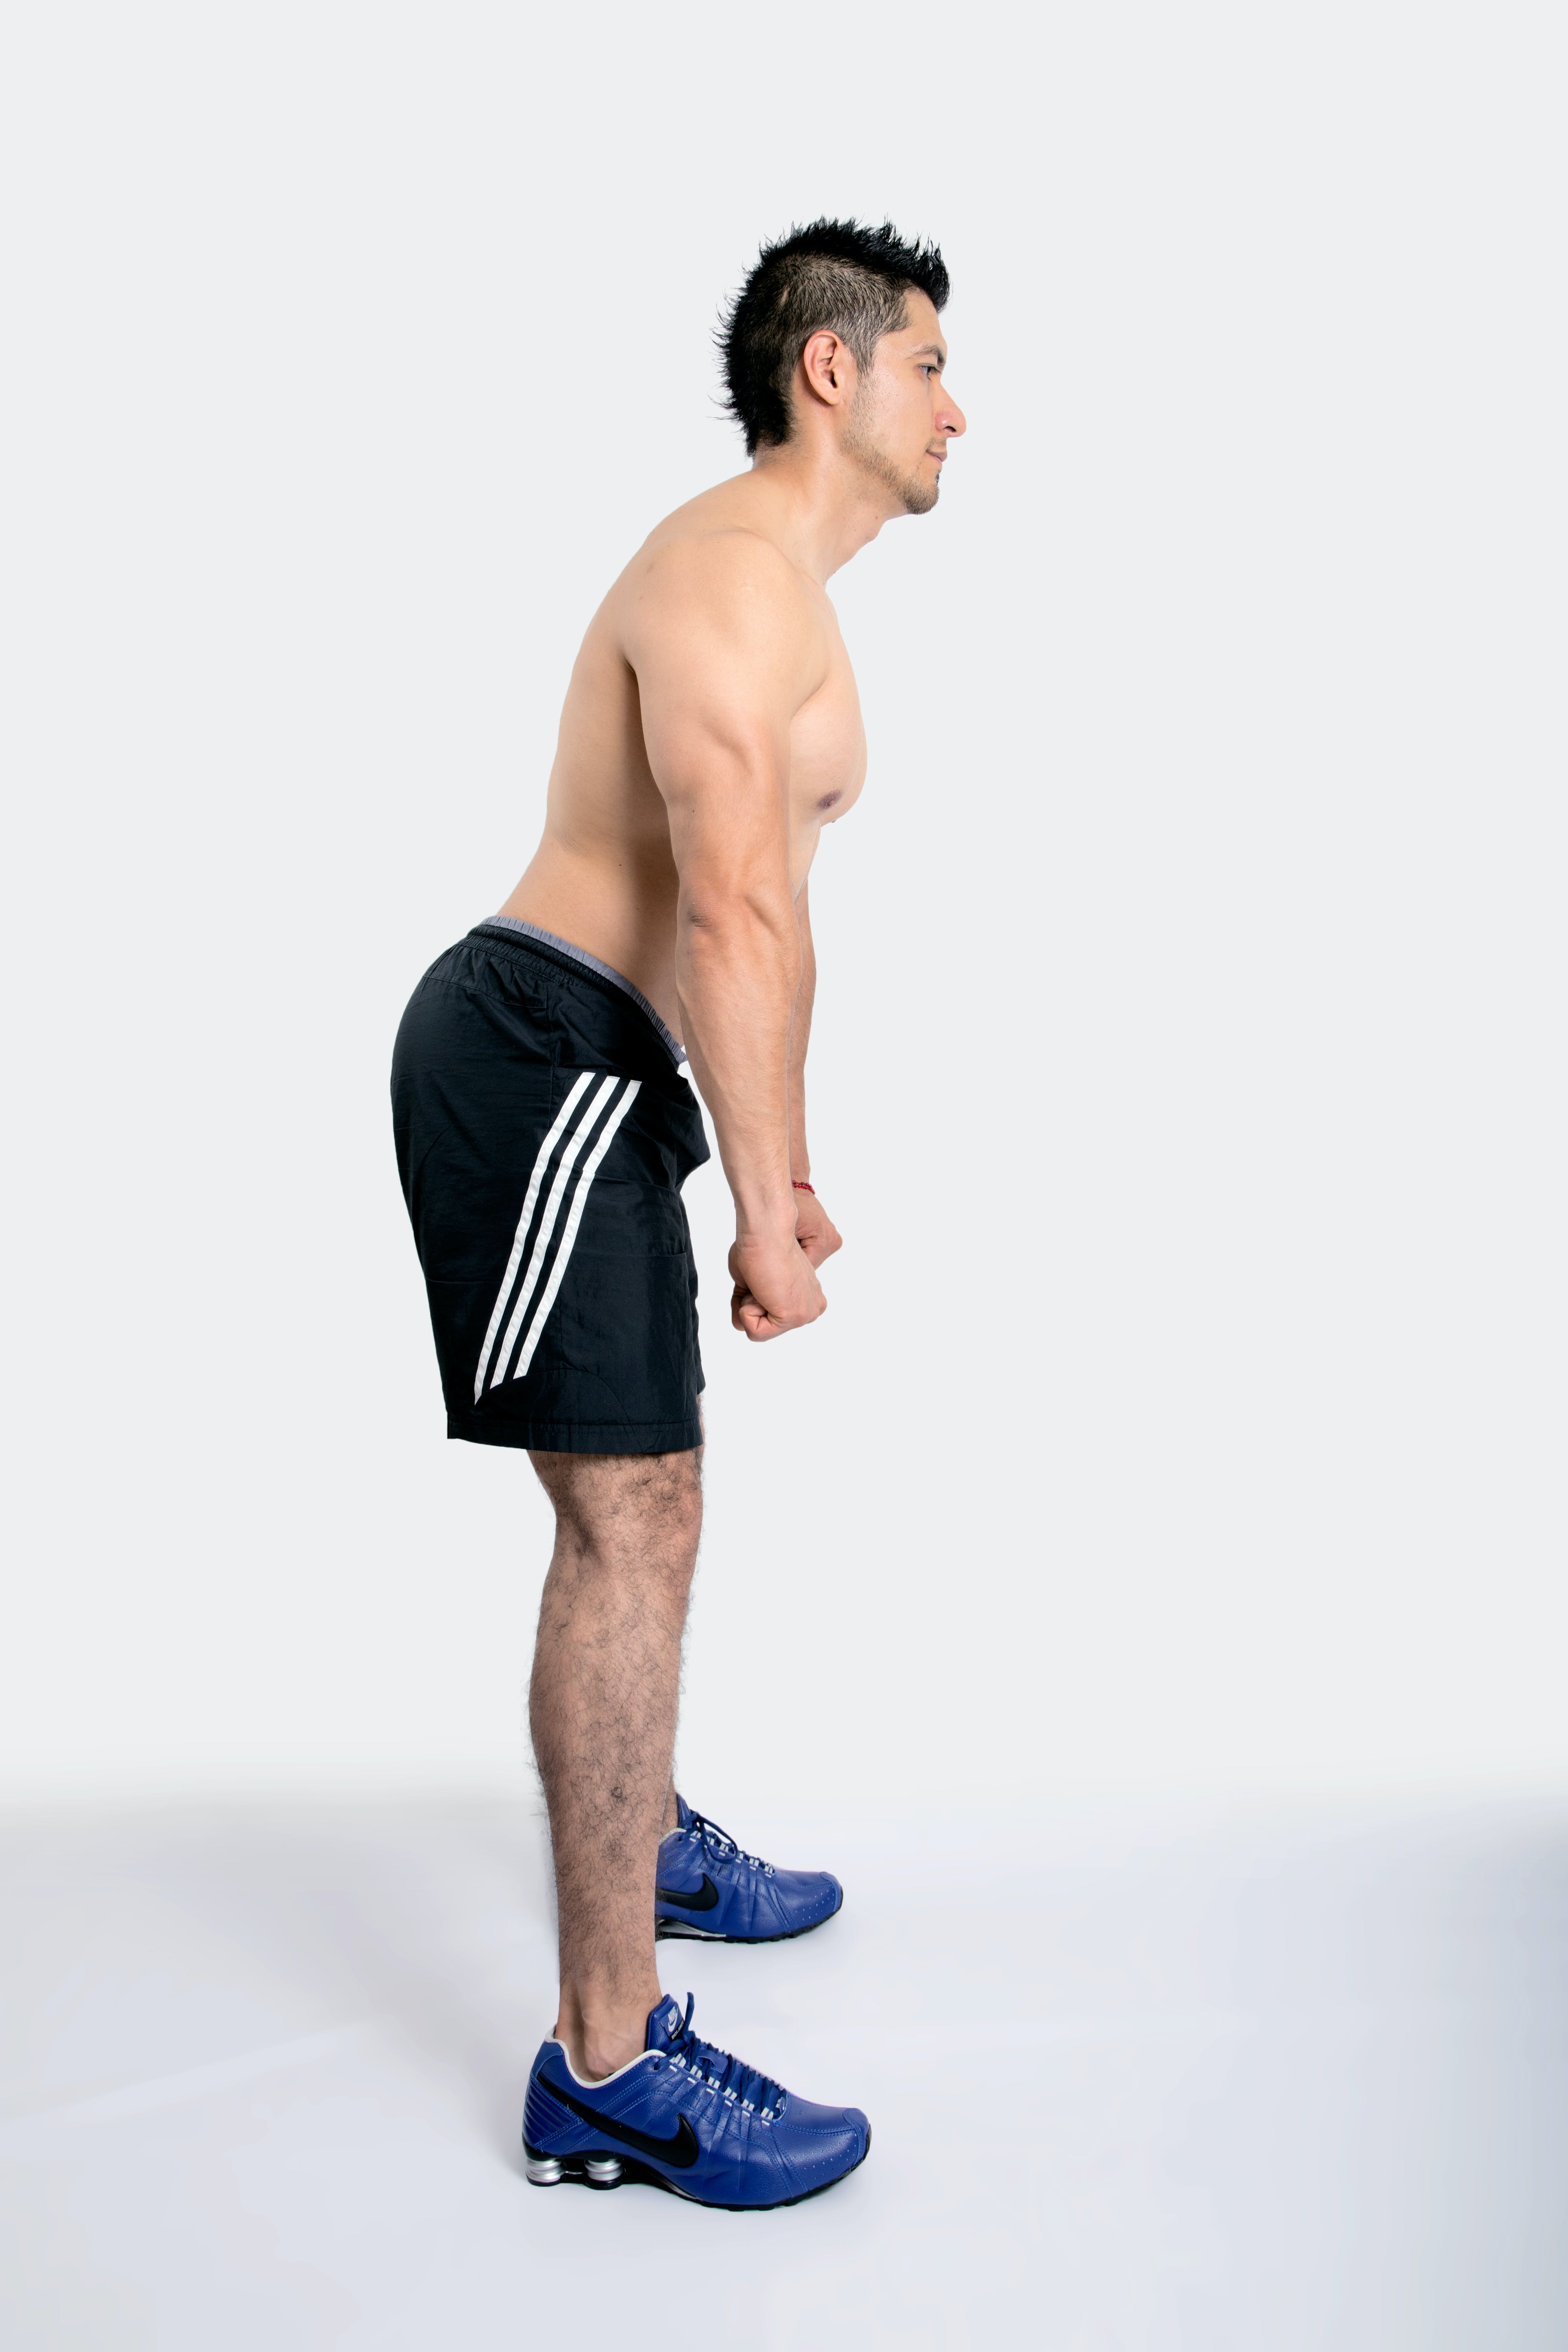 Free stock photo of fitness